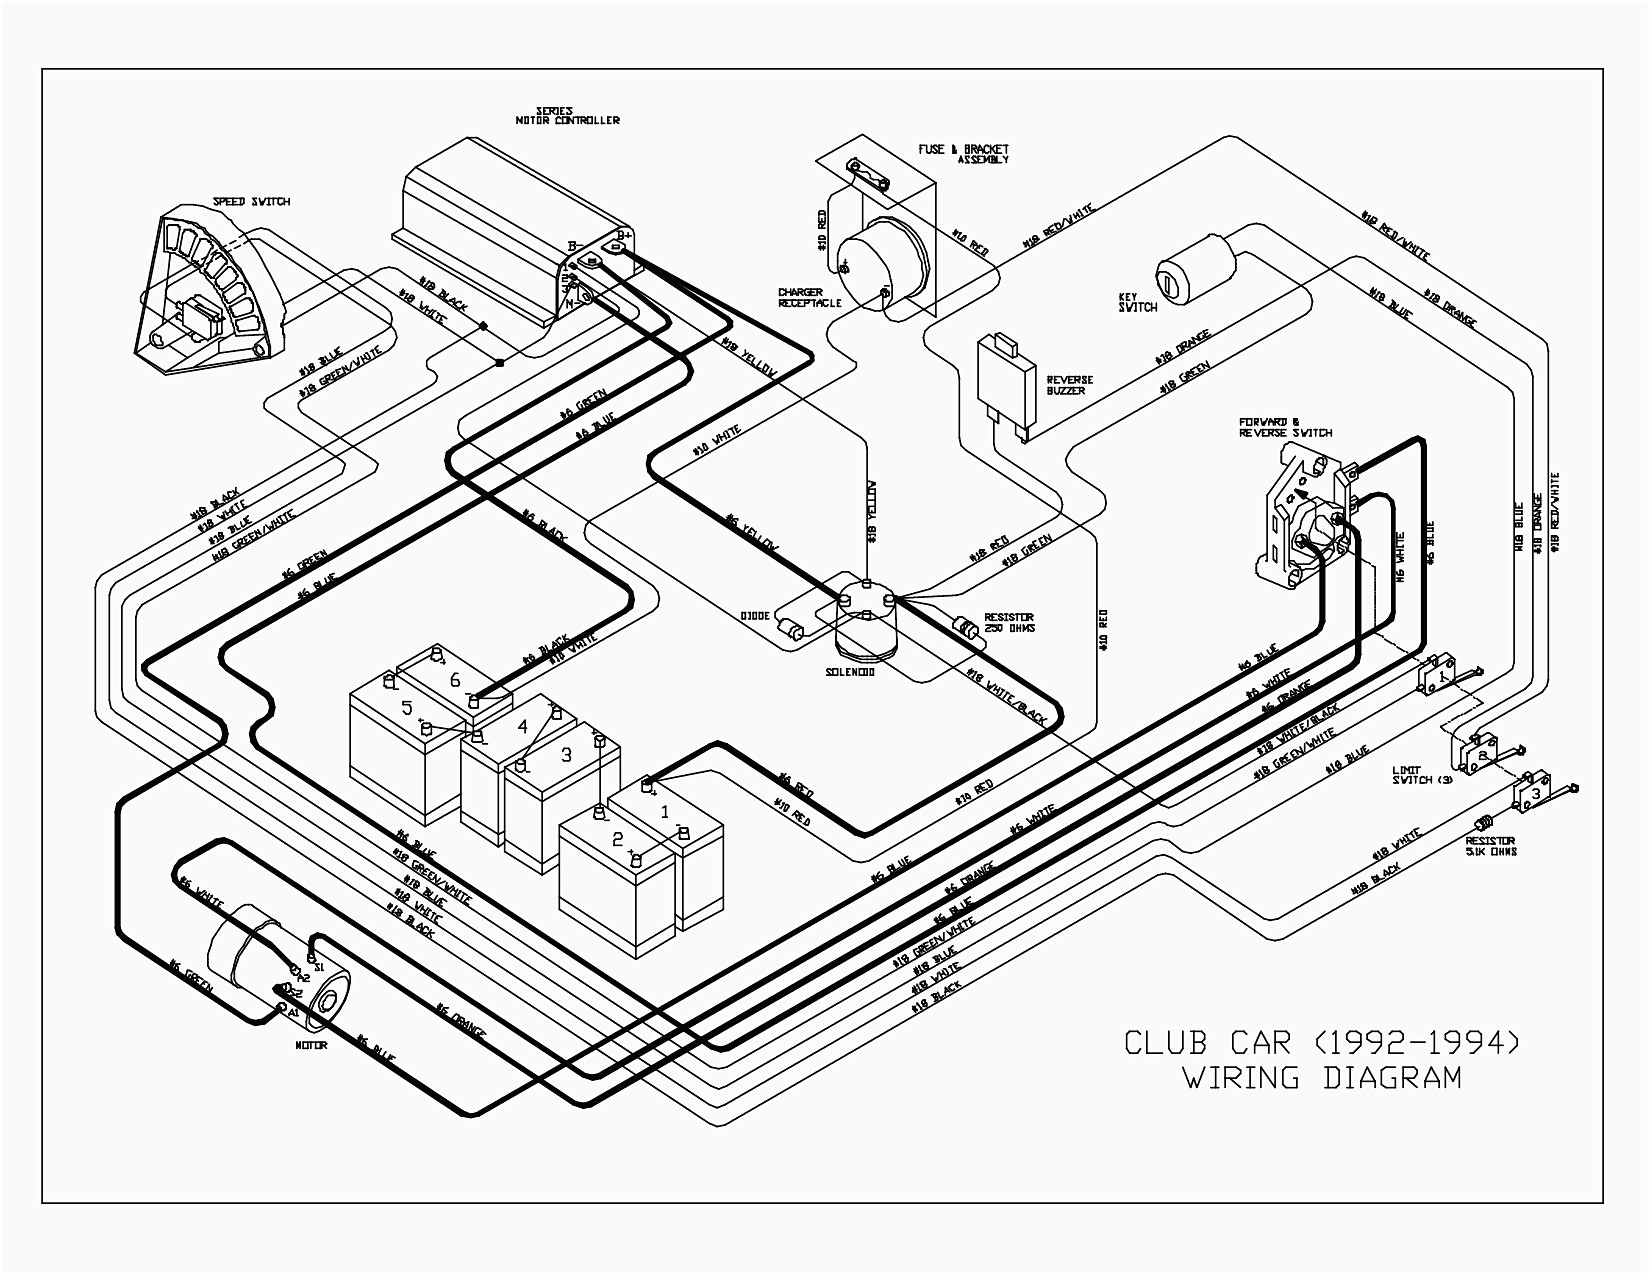 1994 club car wiring diagram wiring diagram image rh mainetreasurechest com 1991 Club Car Wiring Diagram 1985 Club Car Wiring Diagram